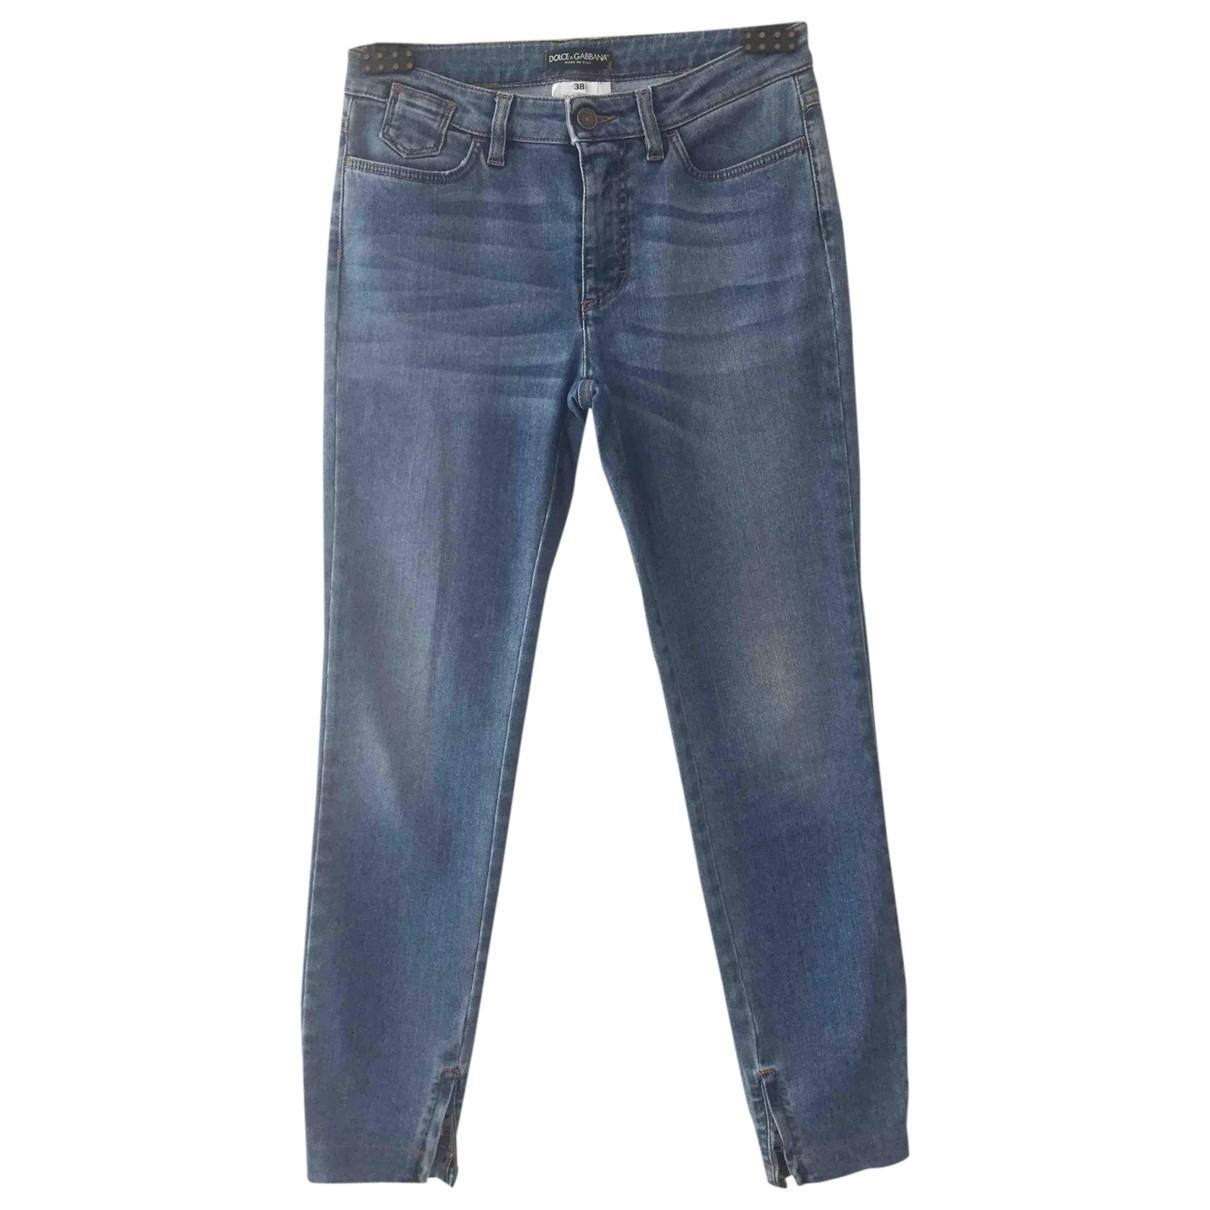 Dolce & Gabbana - Jean   pour femme en coton - bleu